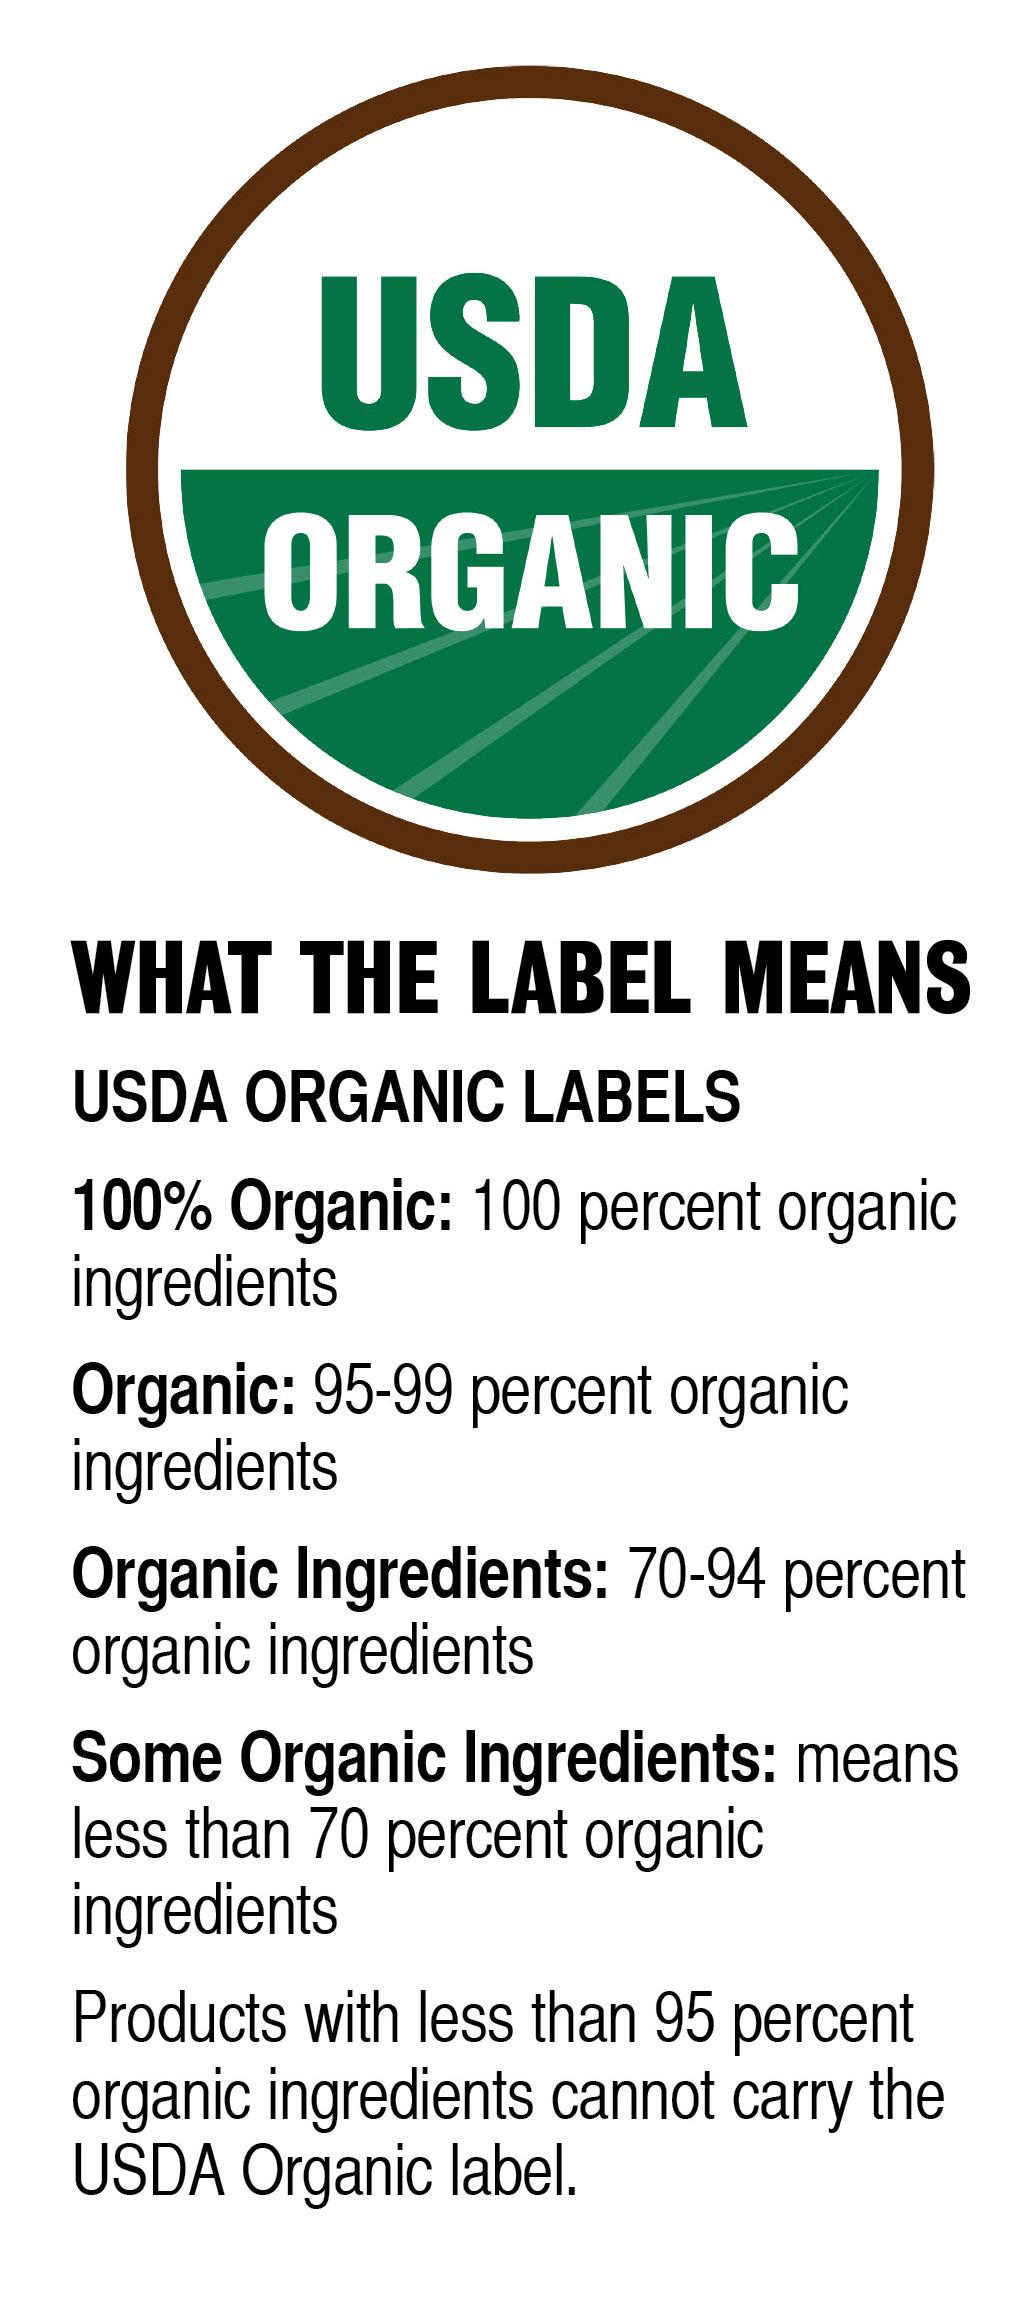 100% Organic: 100 percent organic ingredients. Organic: 95-99 percent organic ingredients  Organic Ingredients: 70-94 percent organic ingredients. Some Organic Ingredients: less than 70 percent organic.